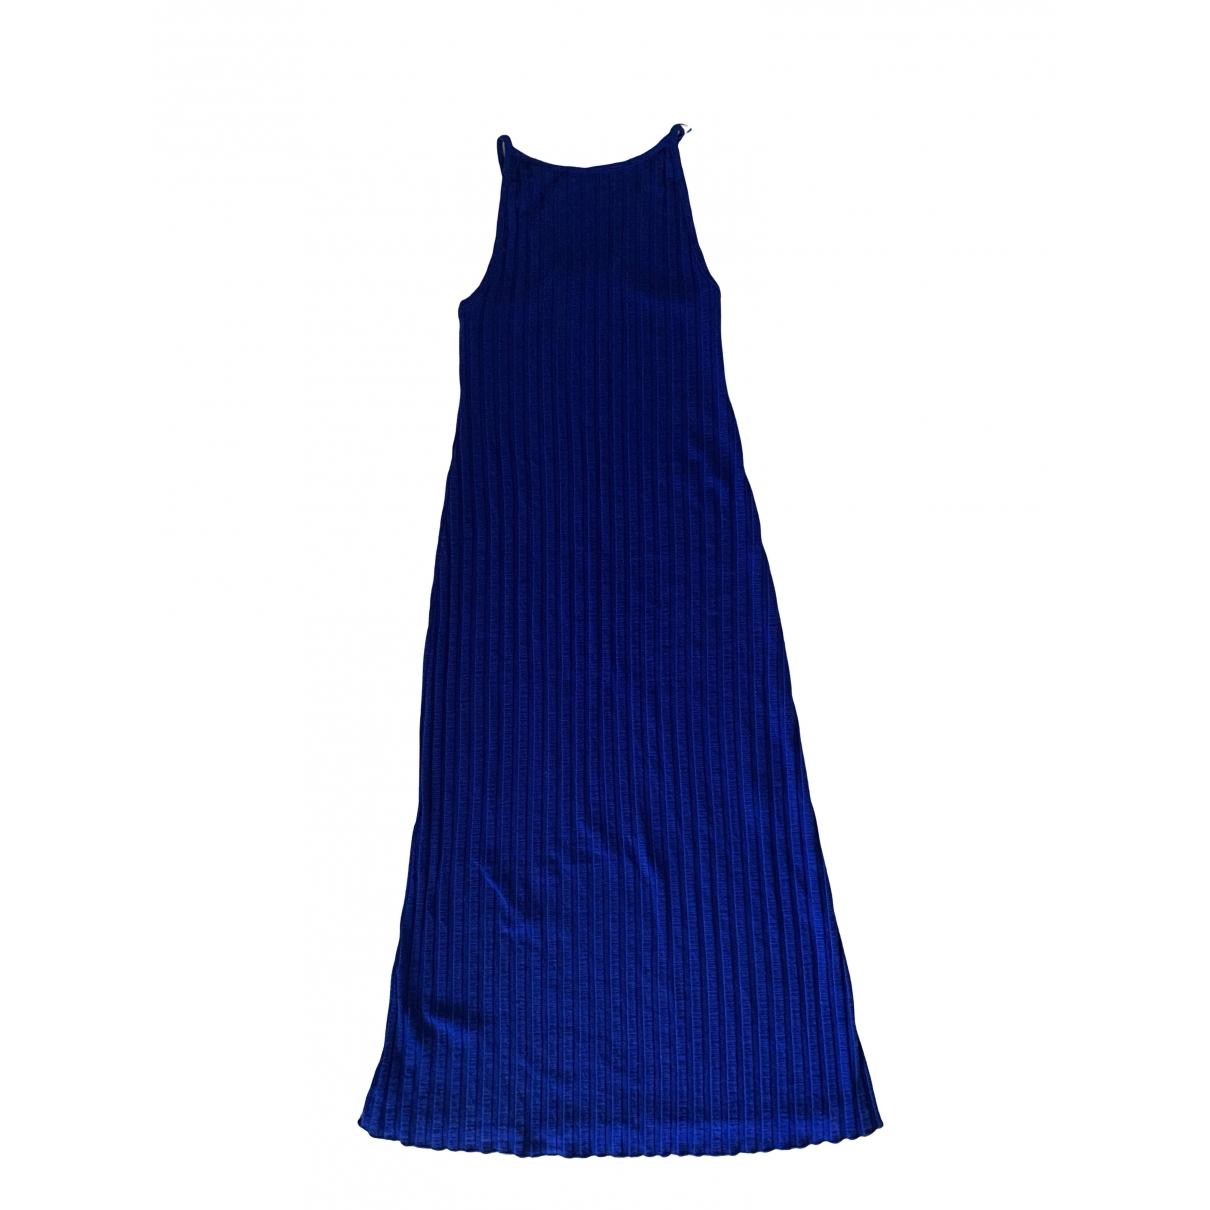 Simon Miller \N Kleid in  Blau Synthetik